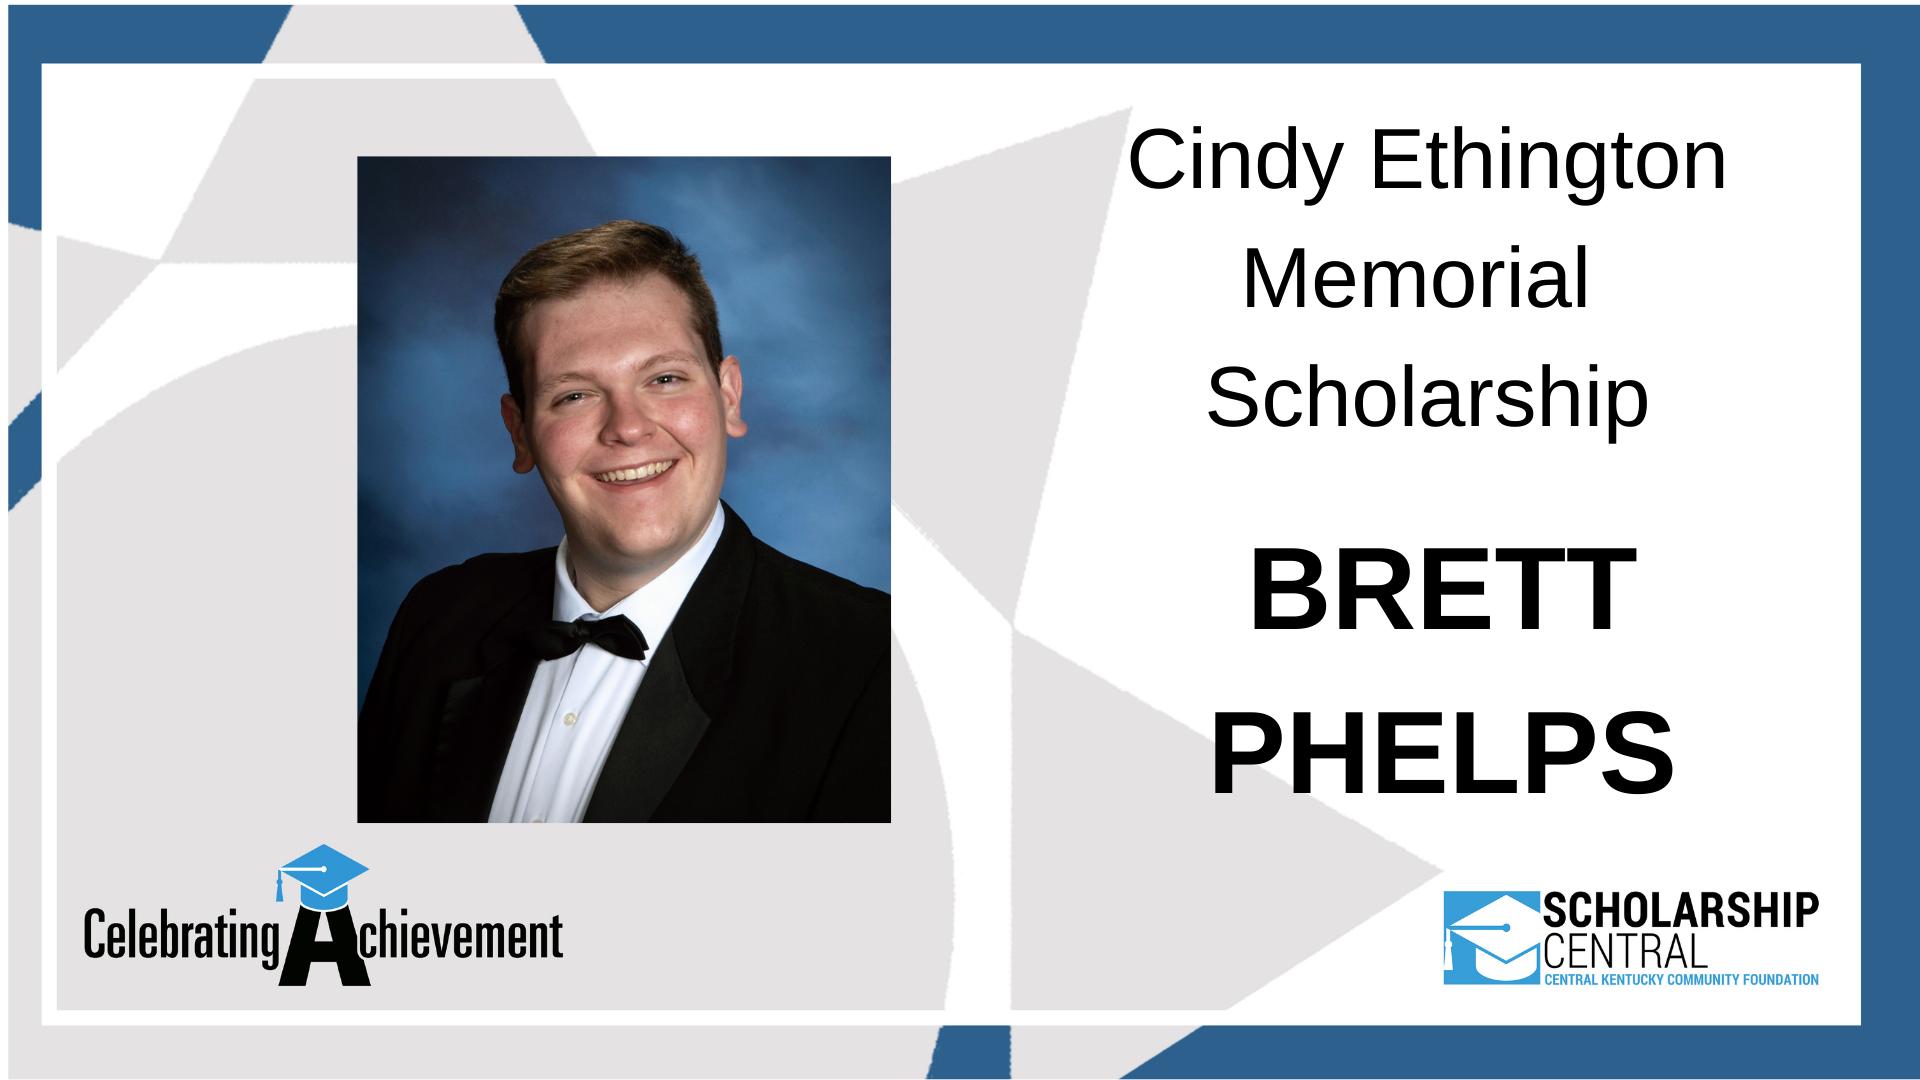 Cindy Ethington Memorial Scholarship Winner